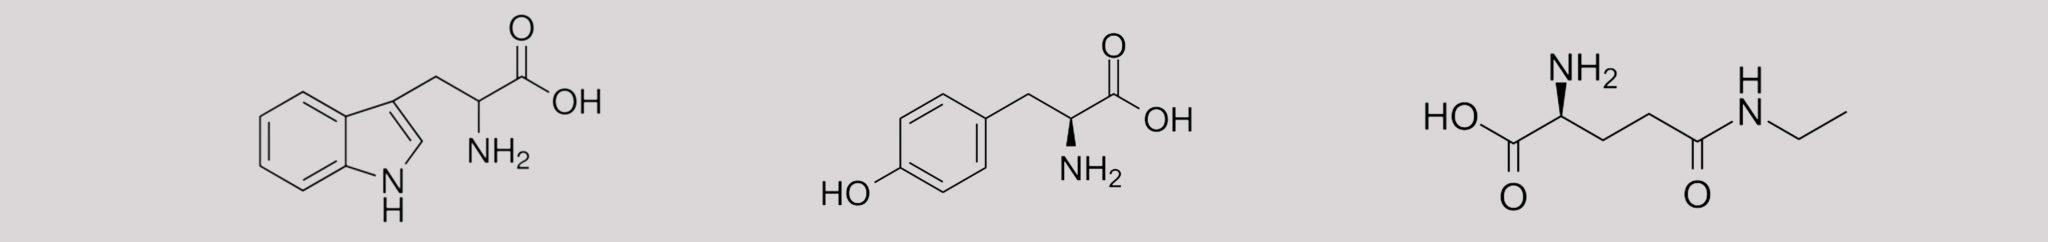 Hydroxychloroquine induced retinopathy